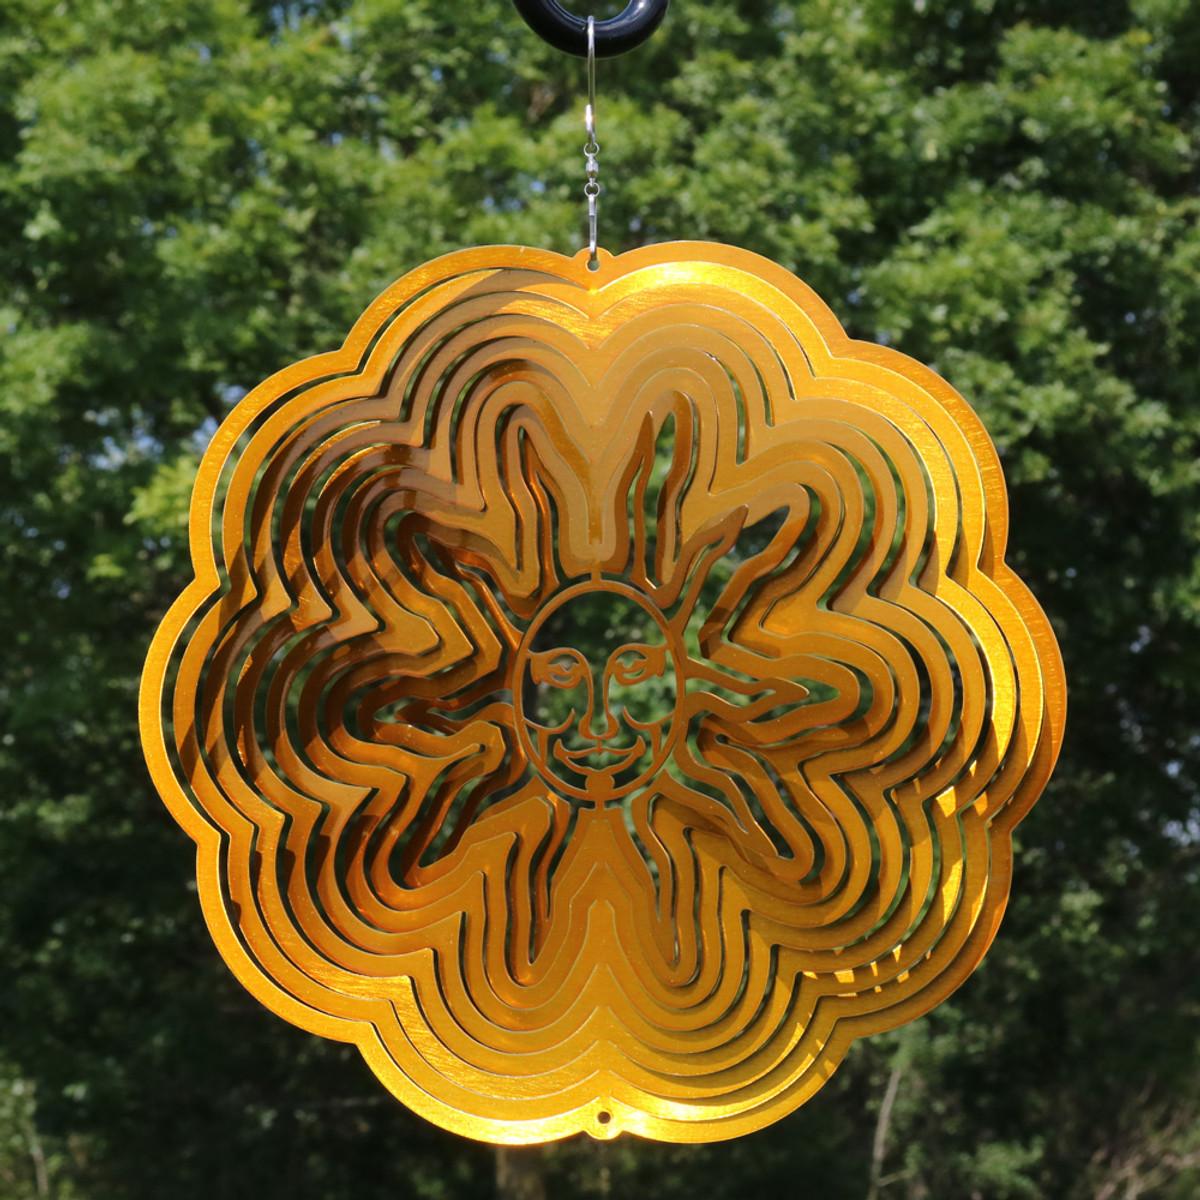 Sunnydaze 3D Sun Wind Spinner with Hook, 12-Inch| Outdoor Décor